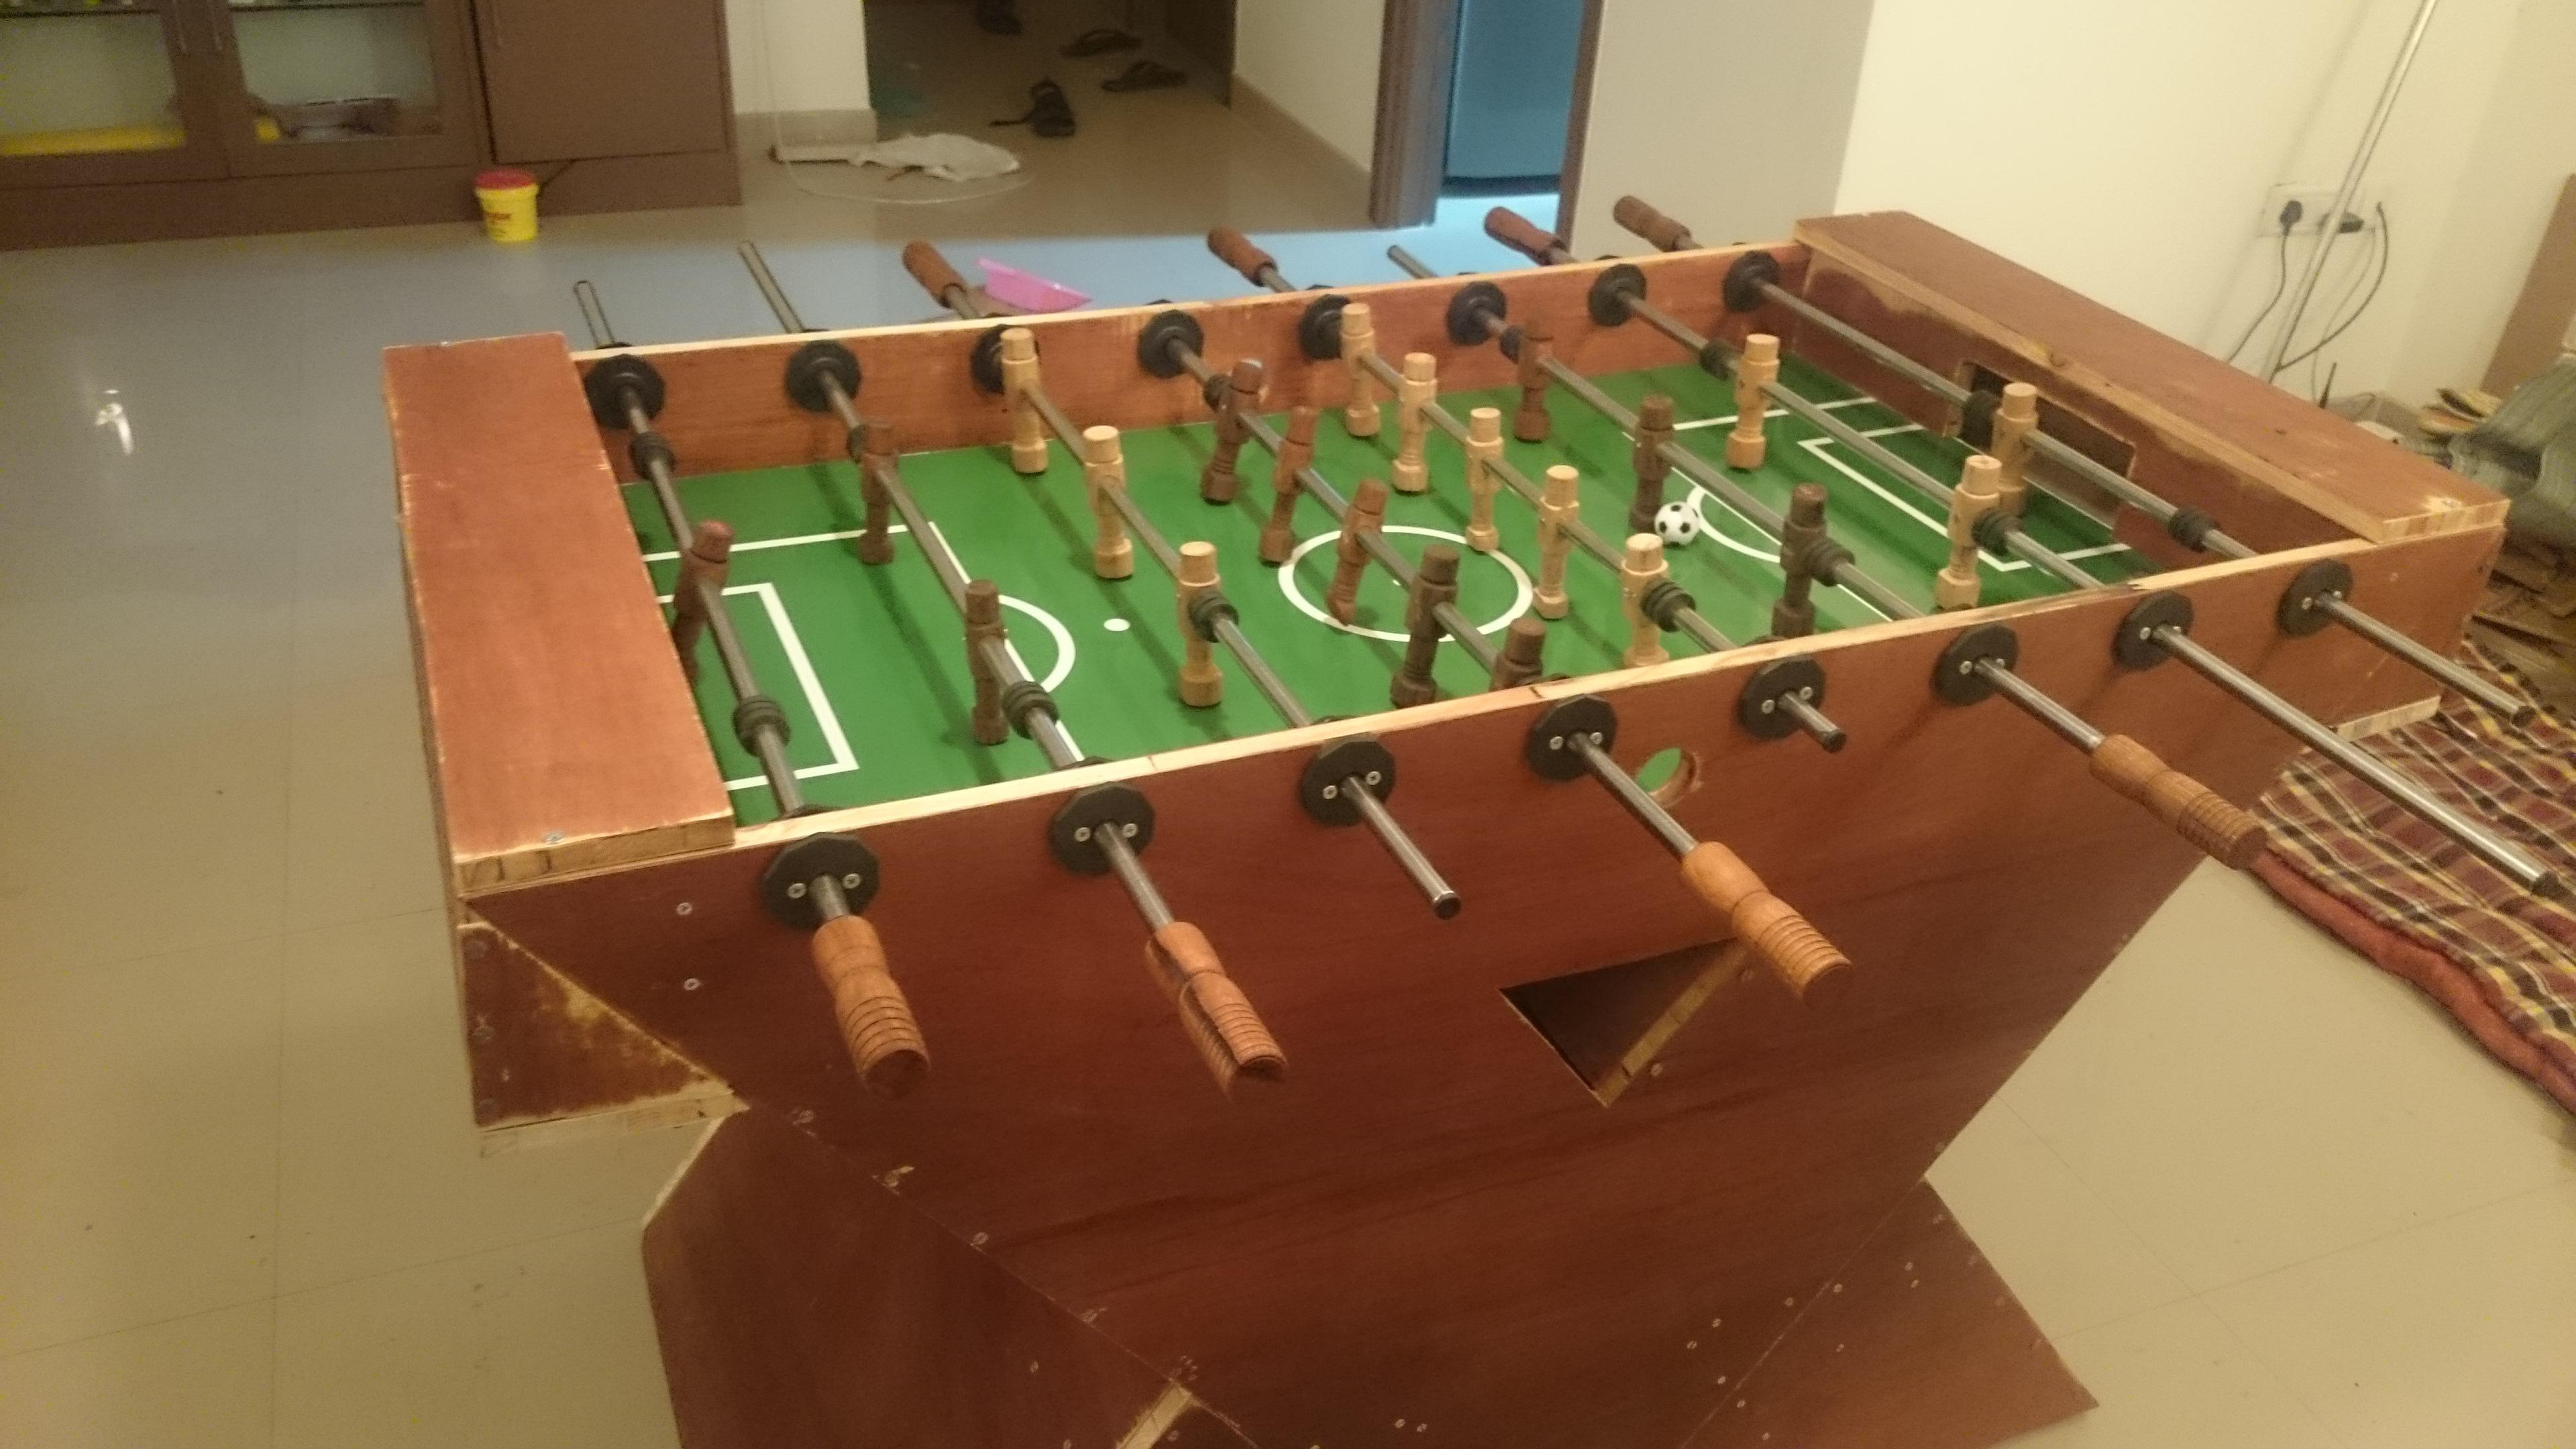 Handmade Wooden Foosball Table On Behance - Regulation foosball table